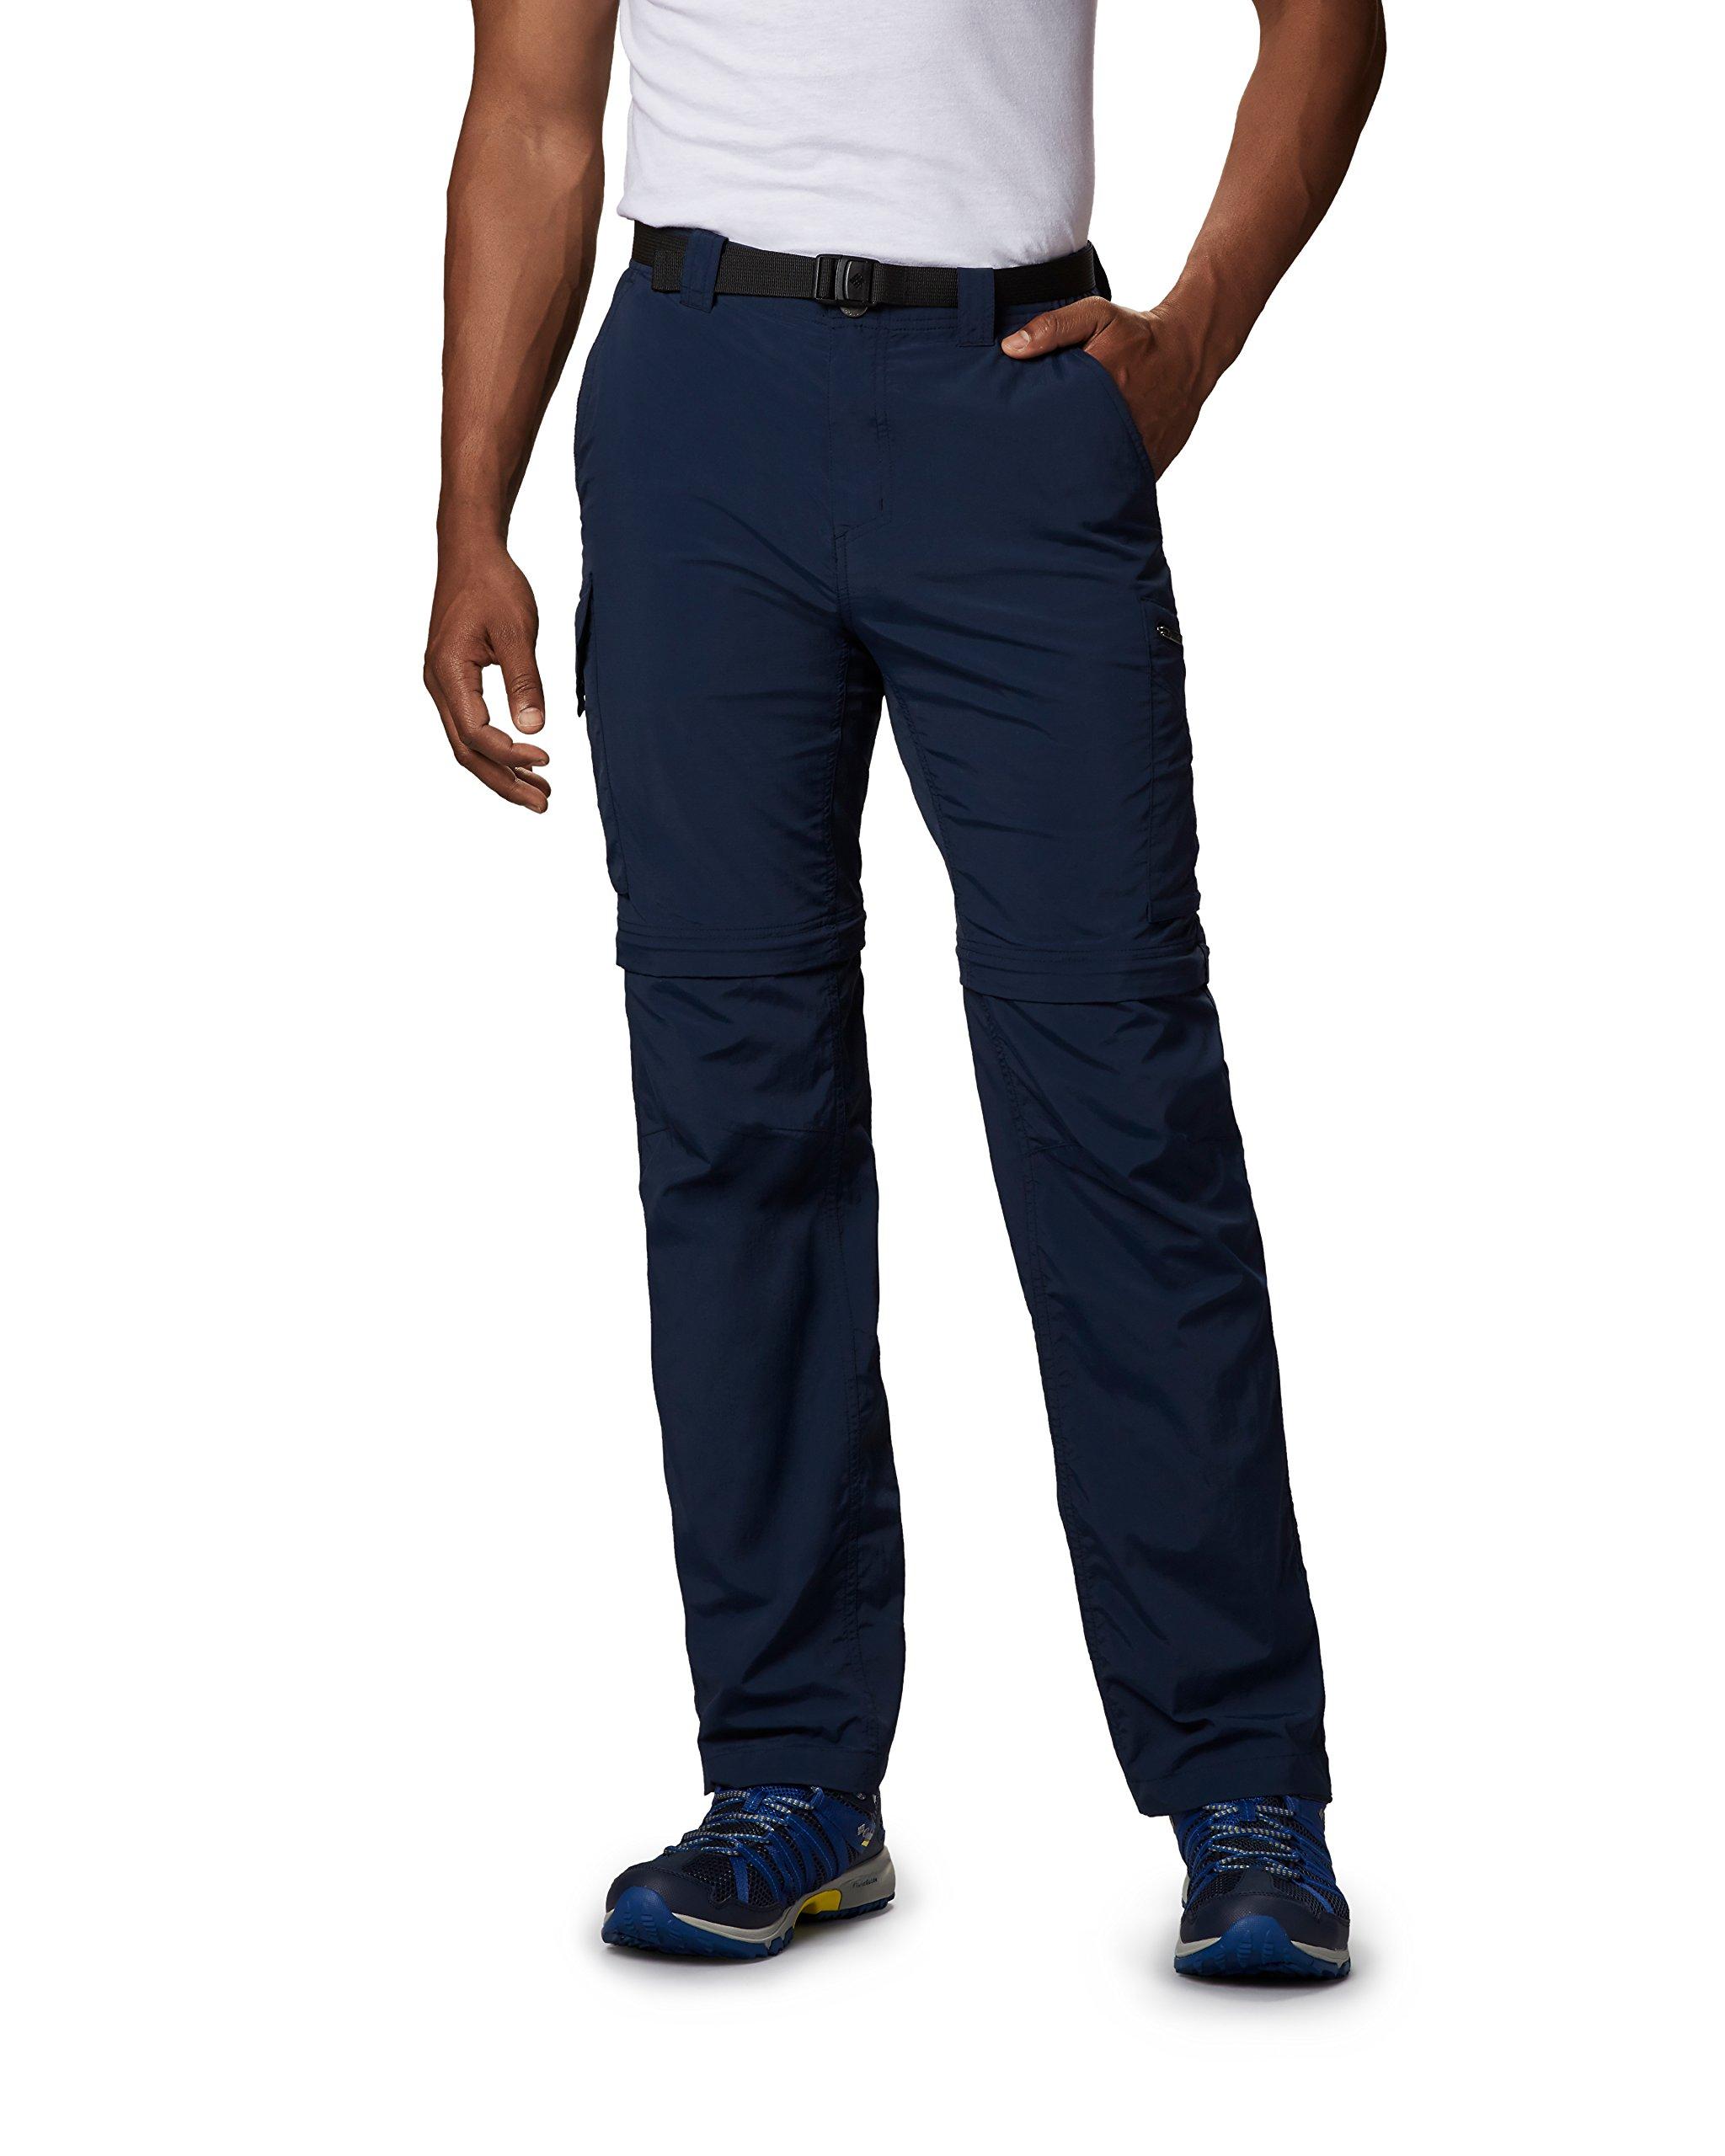 Columbia Men's Silver Ridge Convertible Pant, Breathable, UPF 50 Sun Protection, Collegiate Navy, 30x32